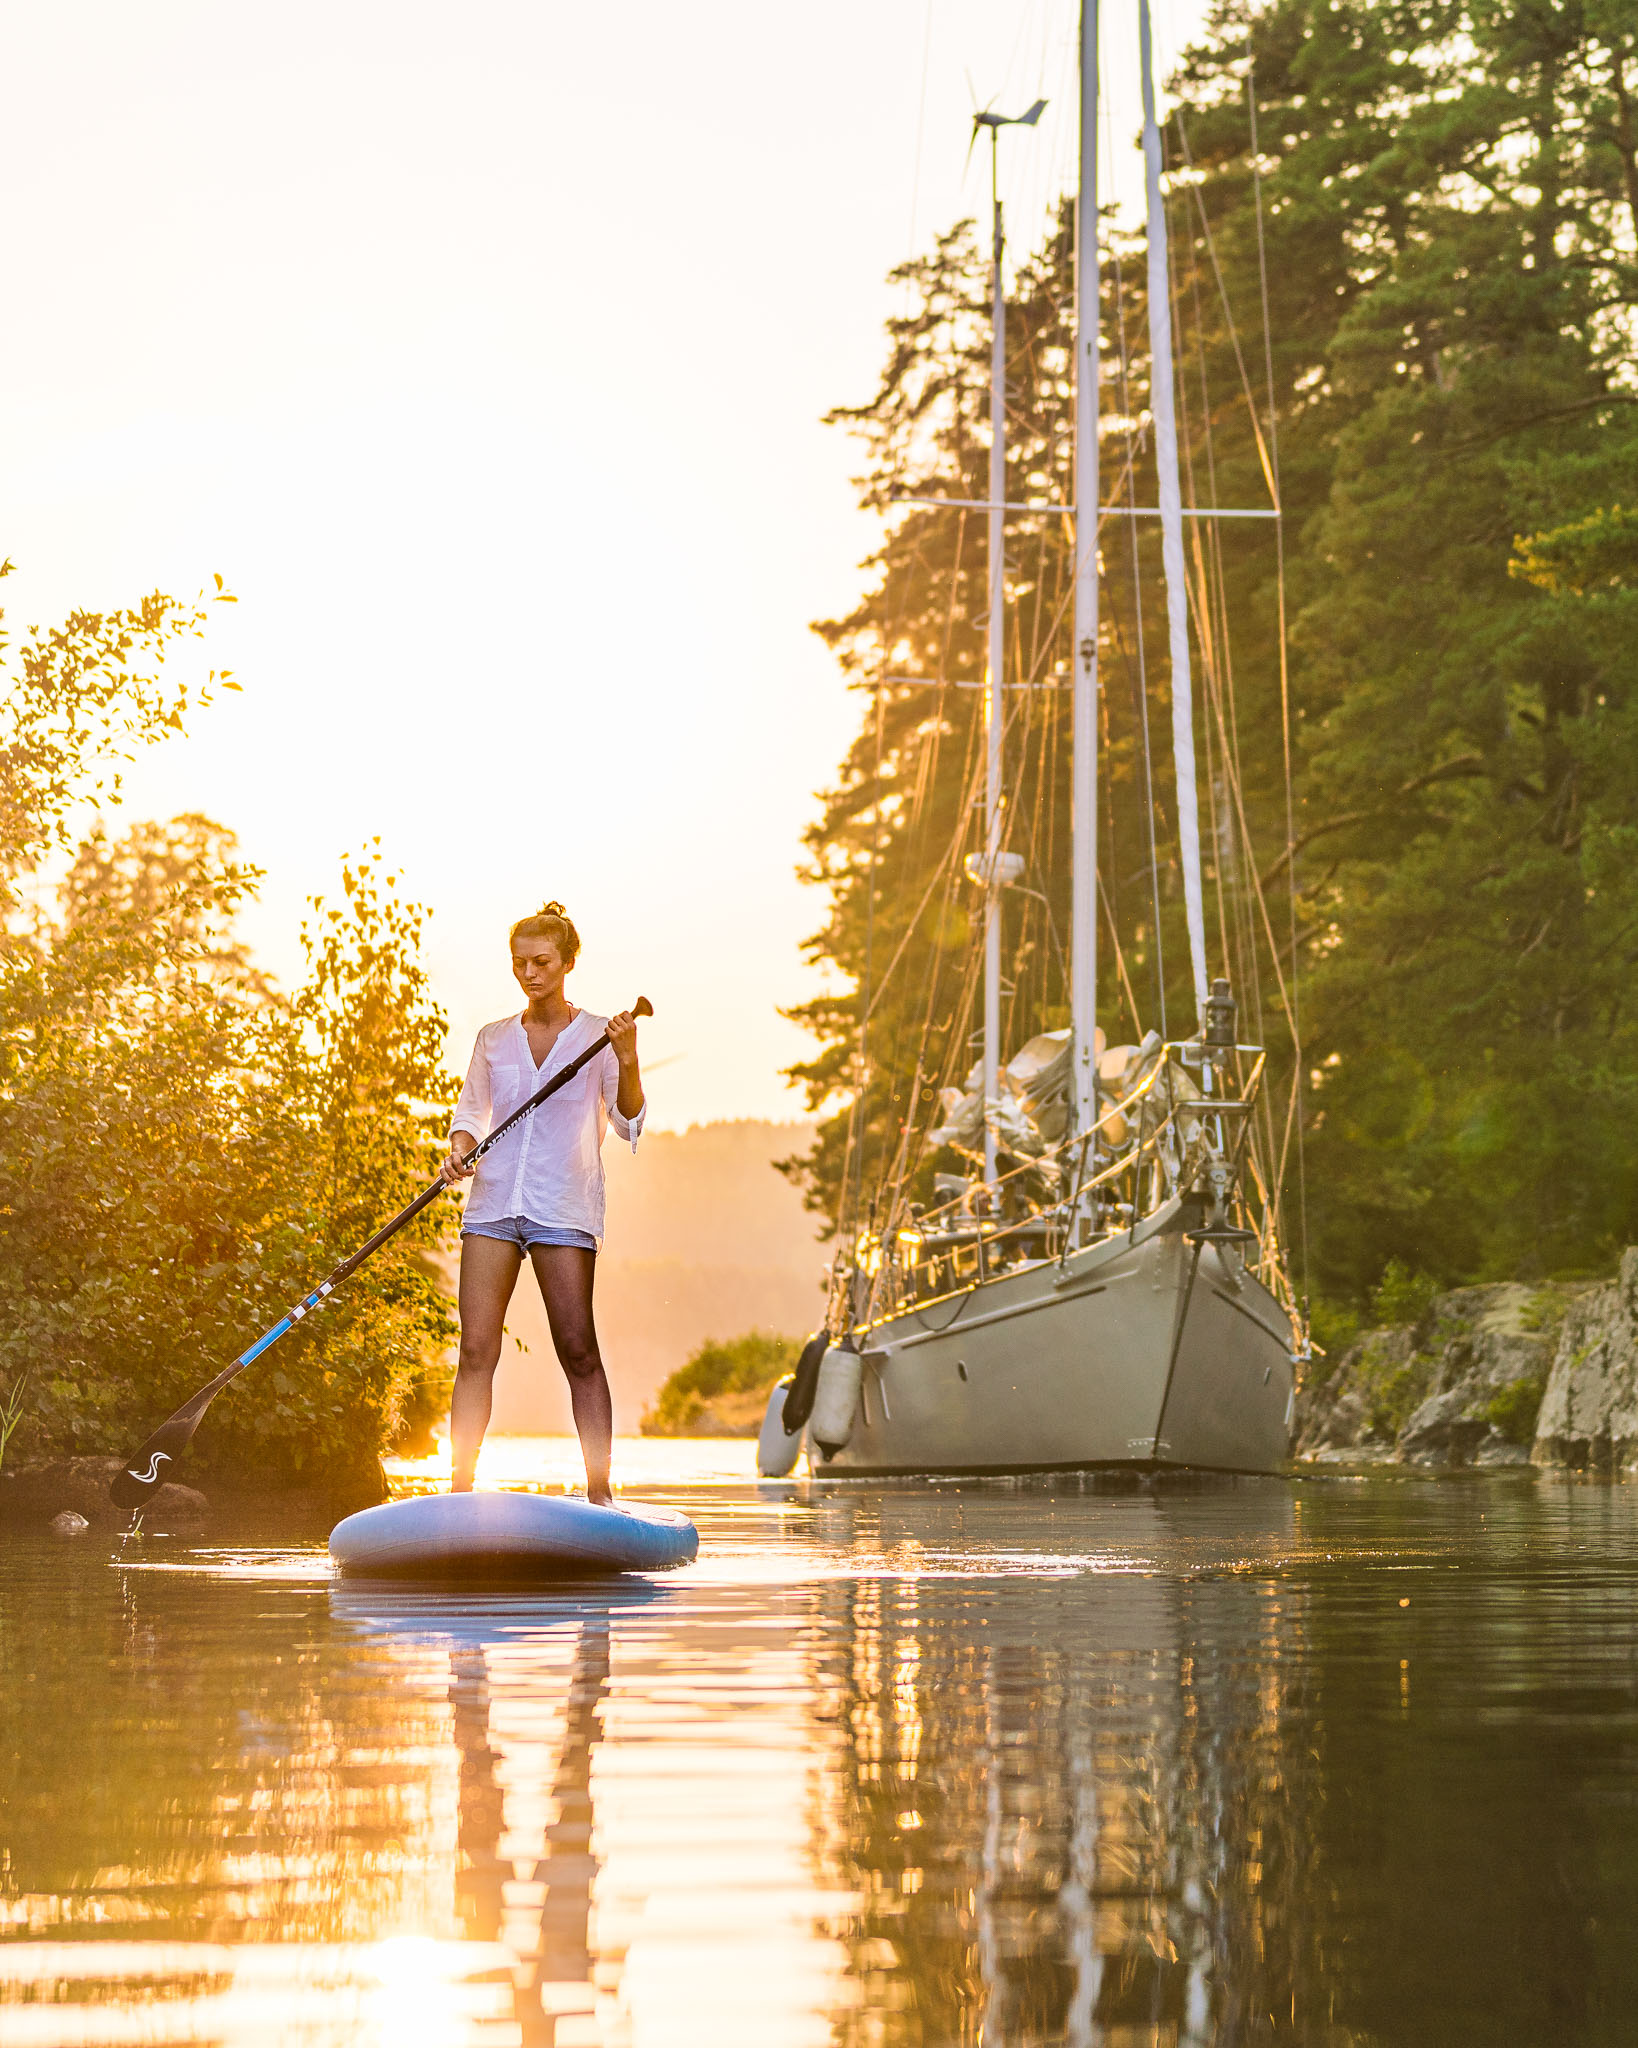 marie-mesi-gota-kanal-sup-boat-standup-paddle-paddla-sverige-forsvik-sweden